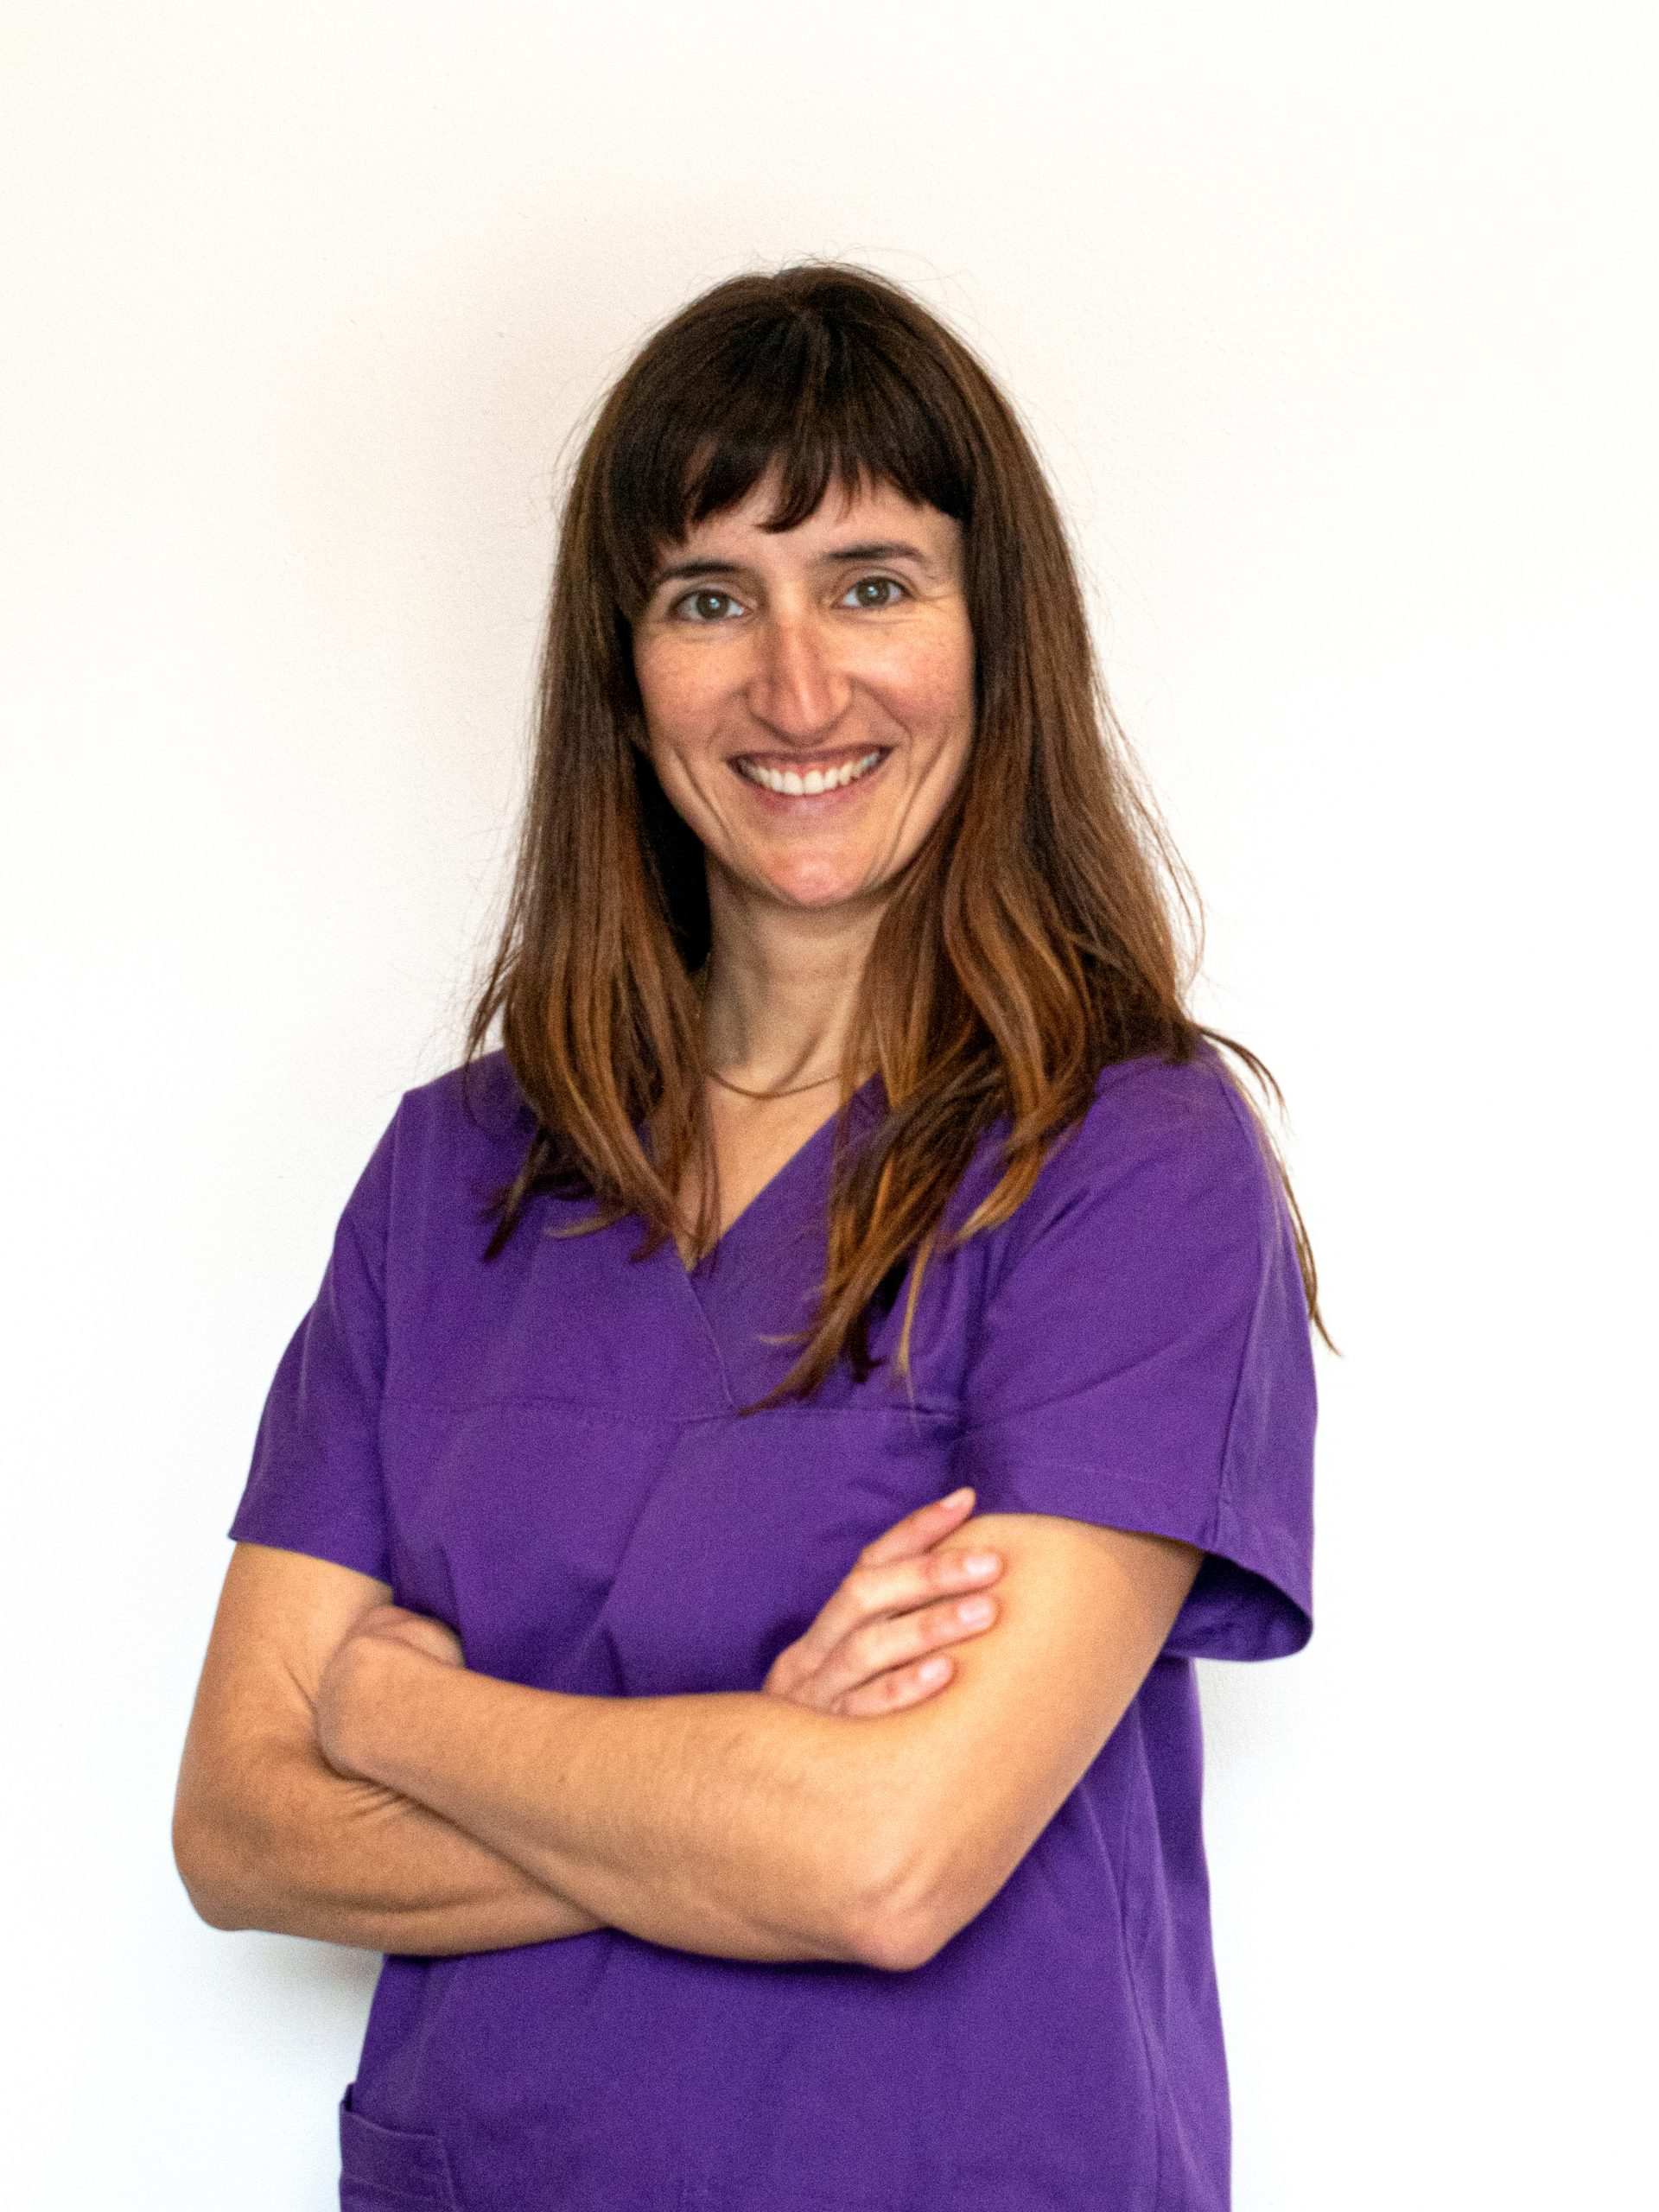 Esther Vives